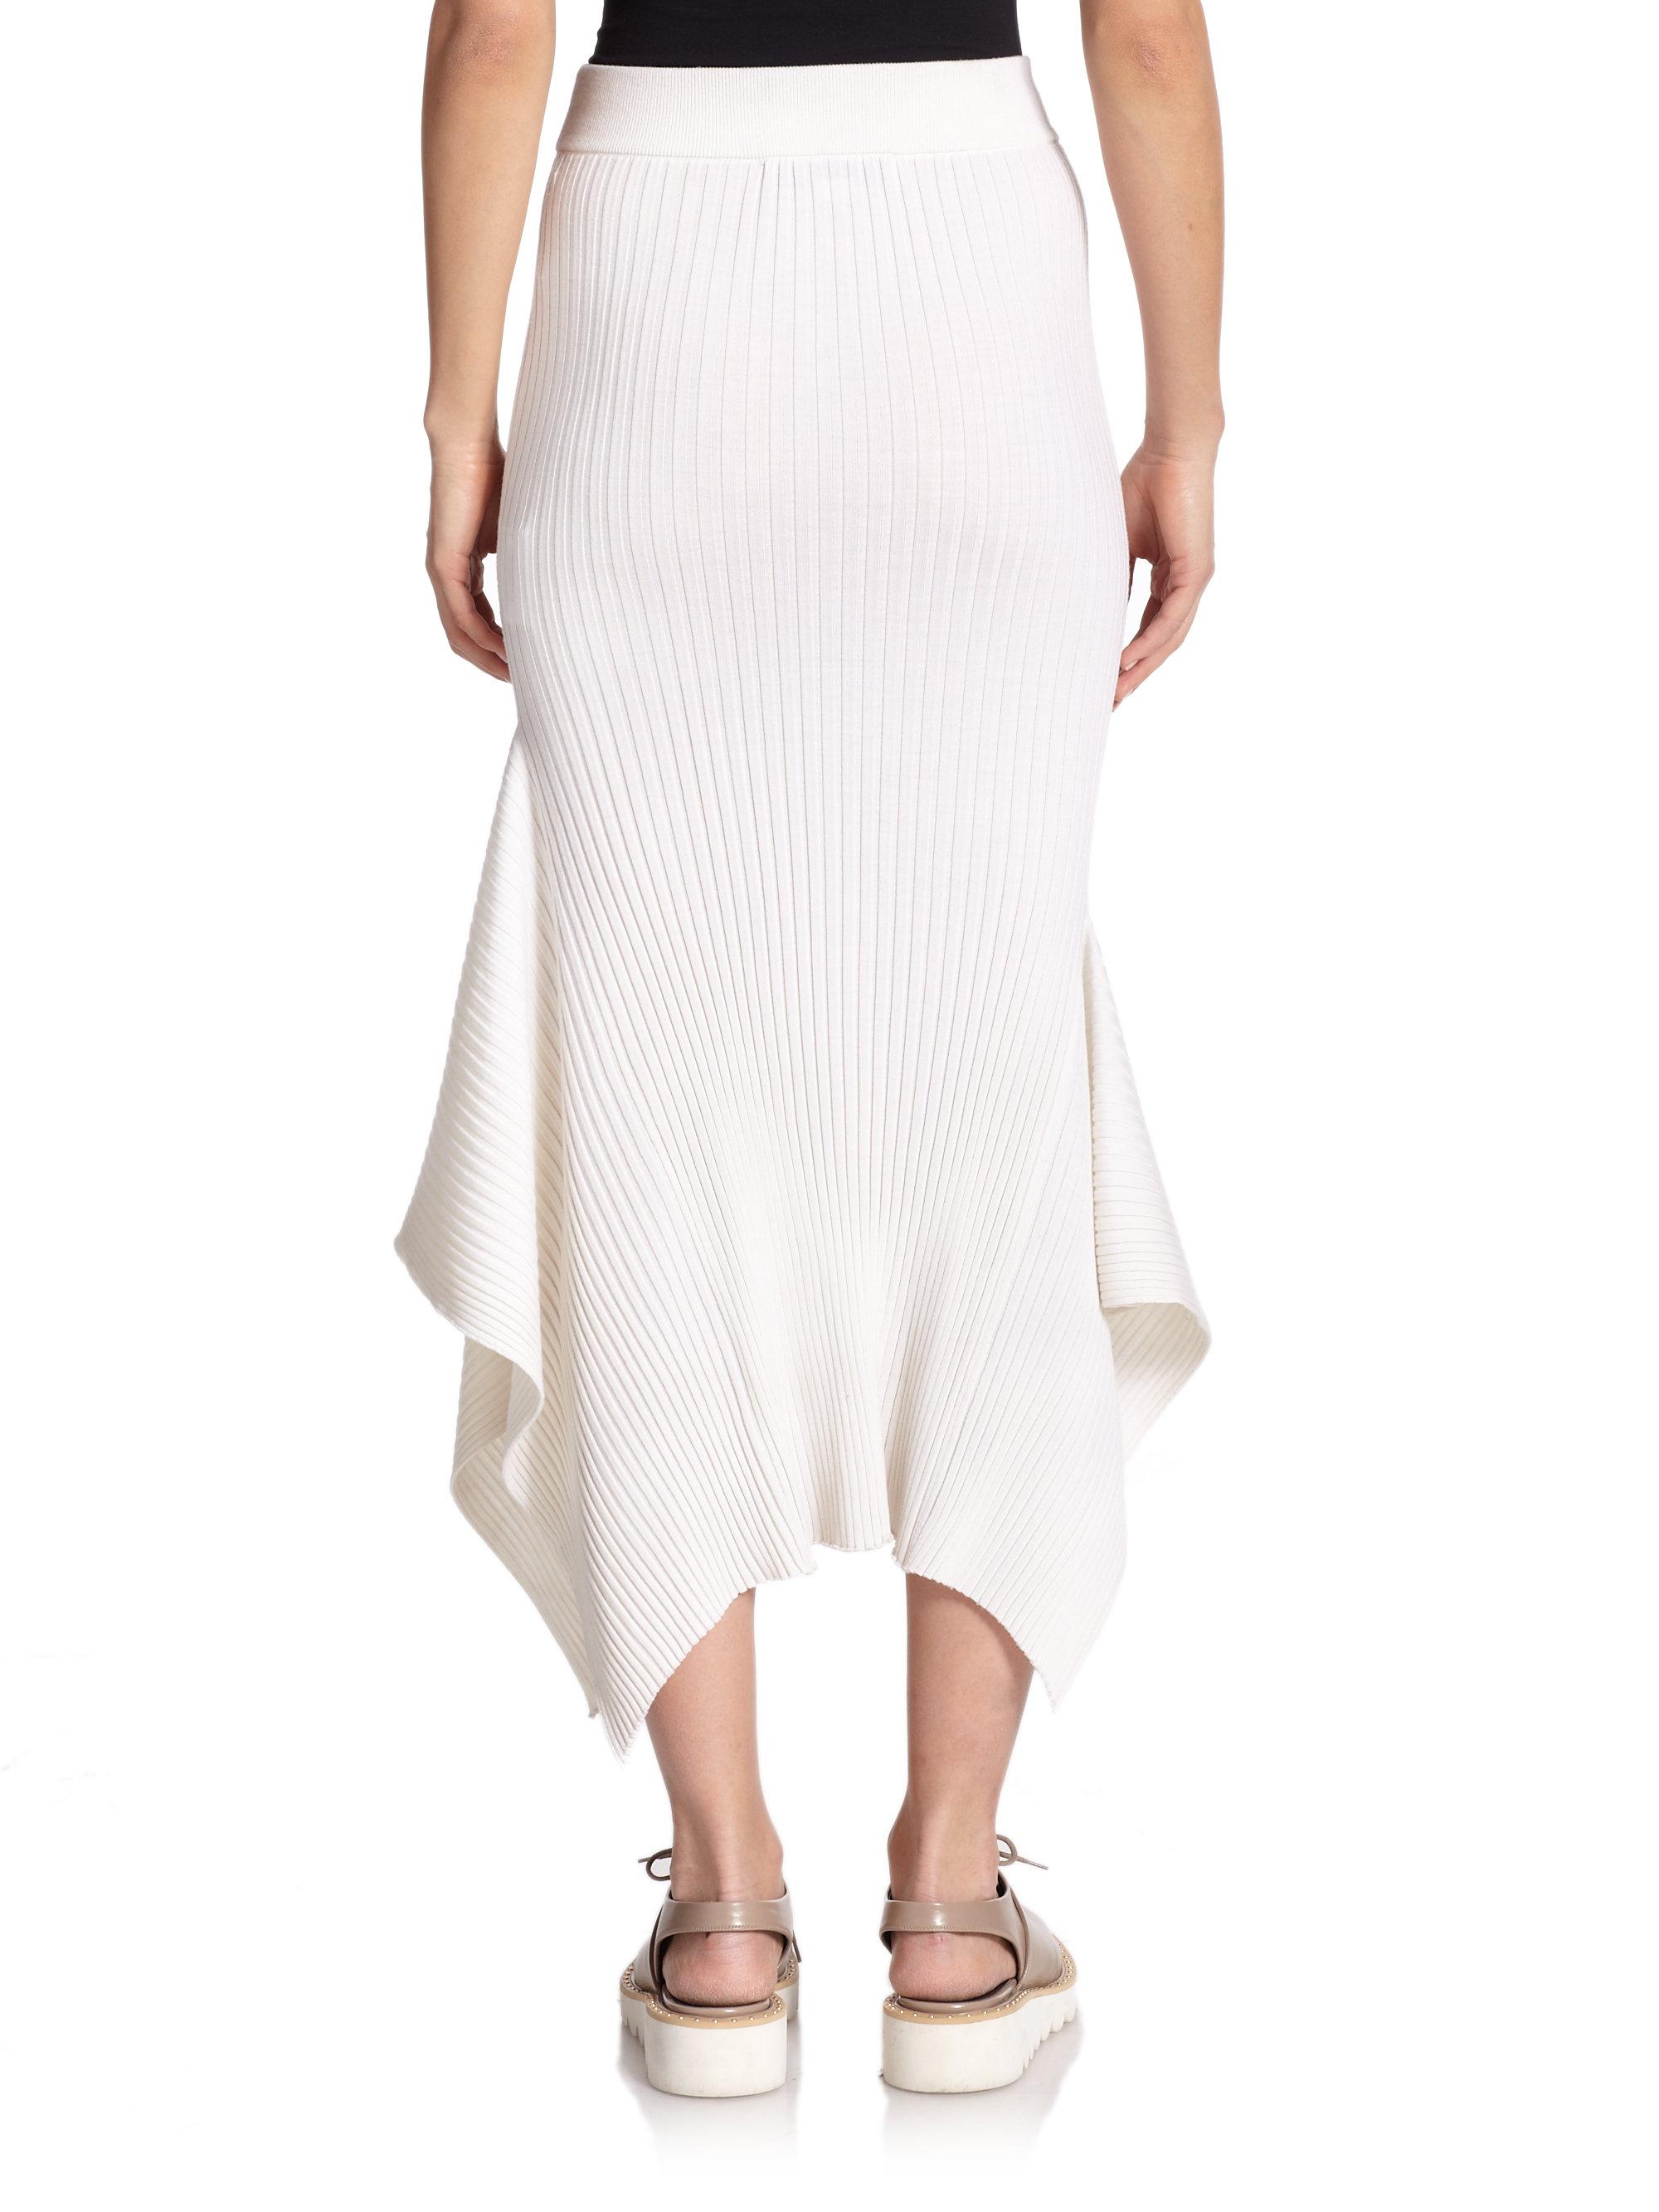 Stella McCartney ribbed knit skirt Wide Range Of WINksQ2Y